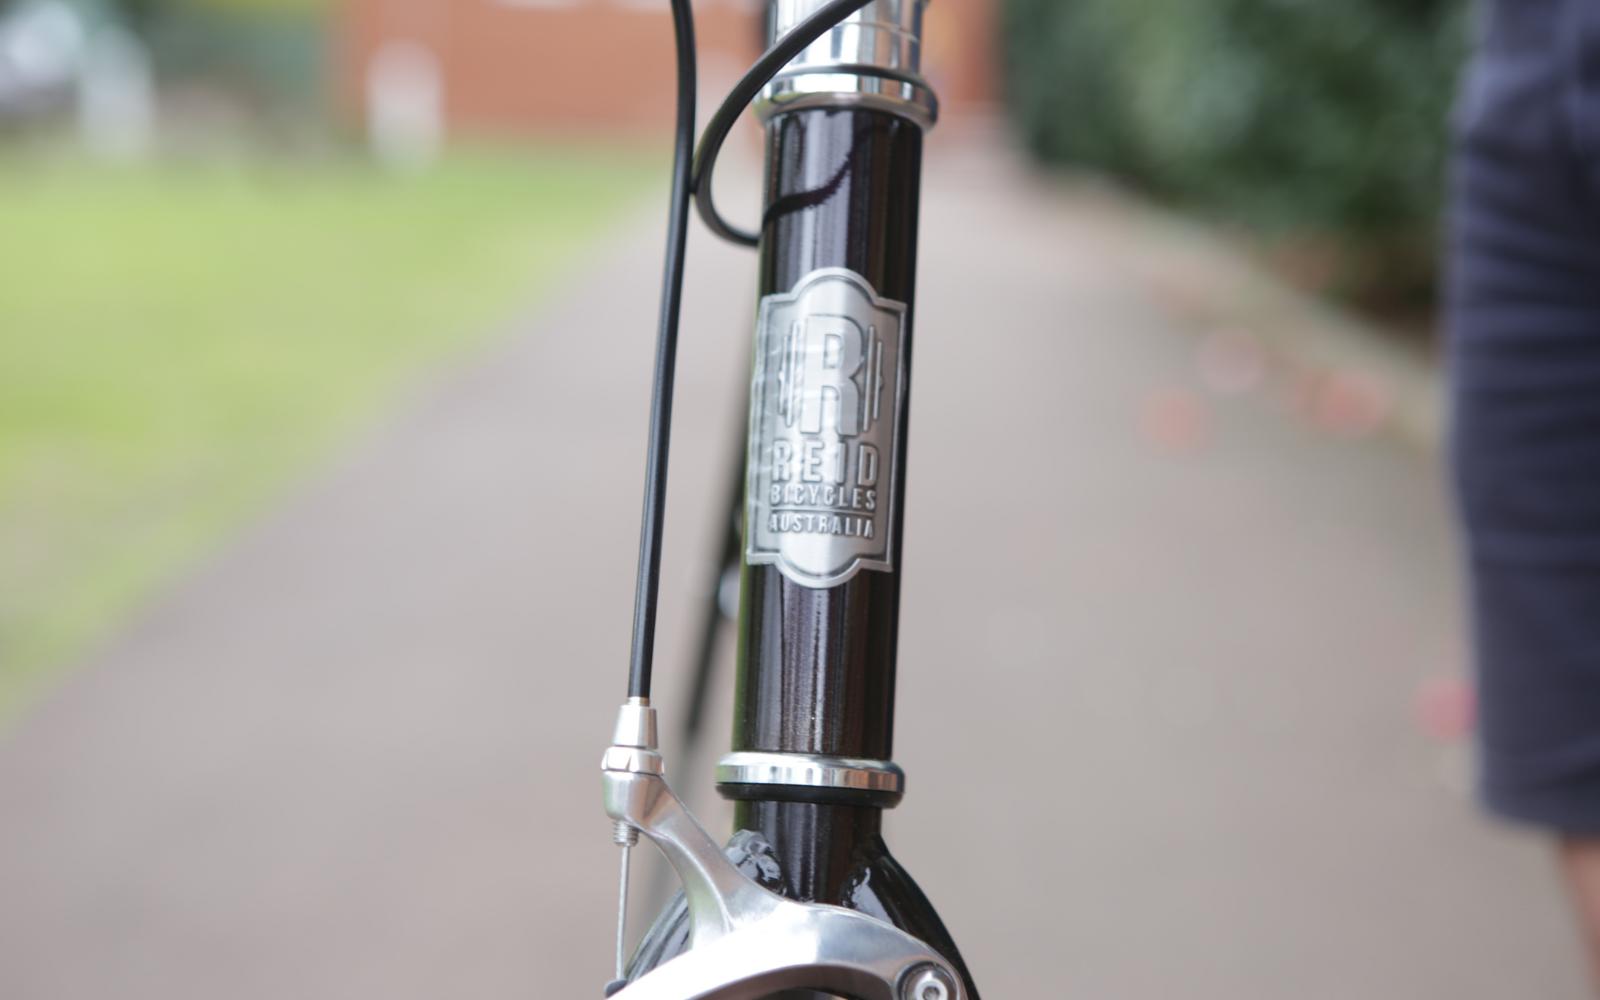 7 20 - Reid ® - Wayfarer Bike